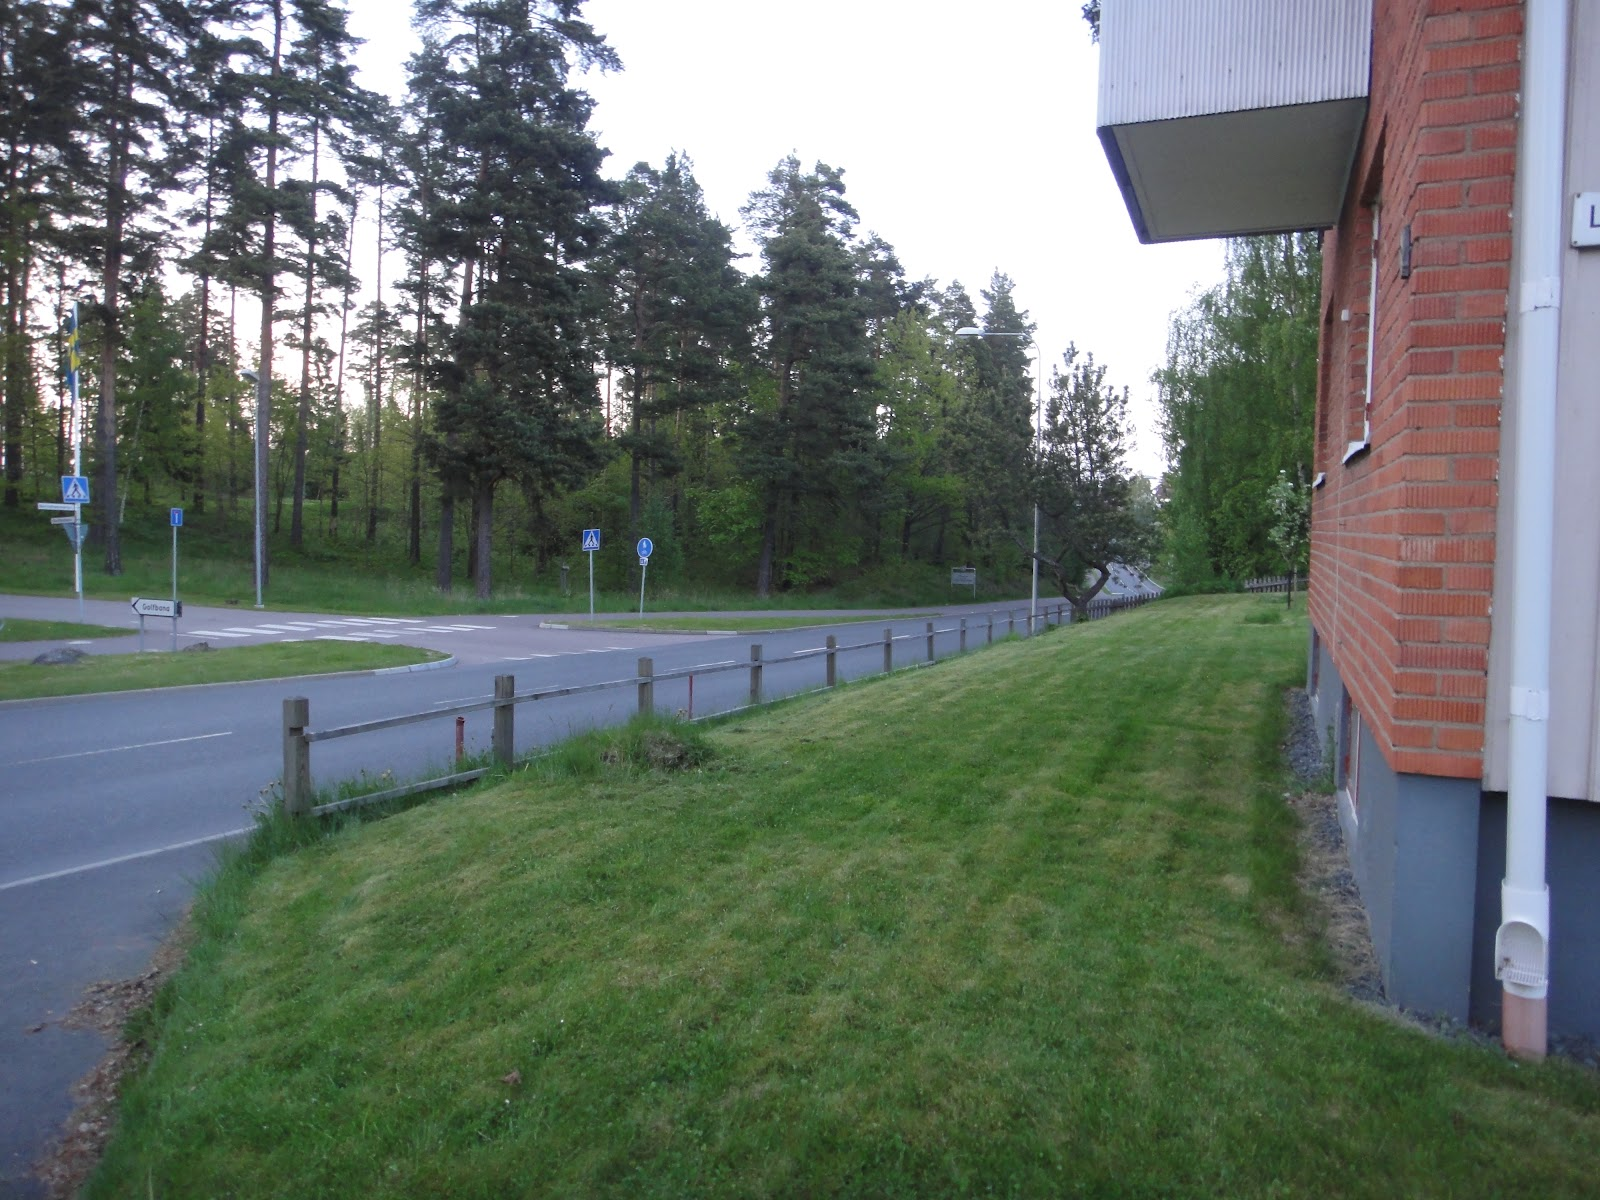 Annarsbra: trädgårdsarkitektur